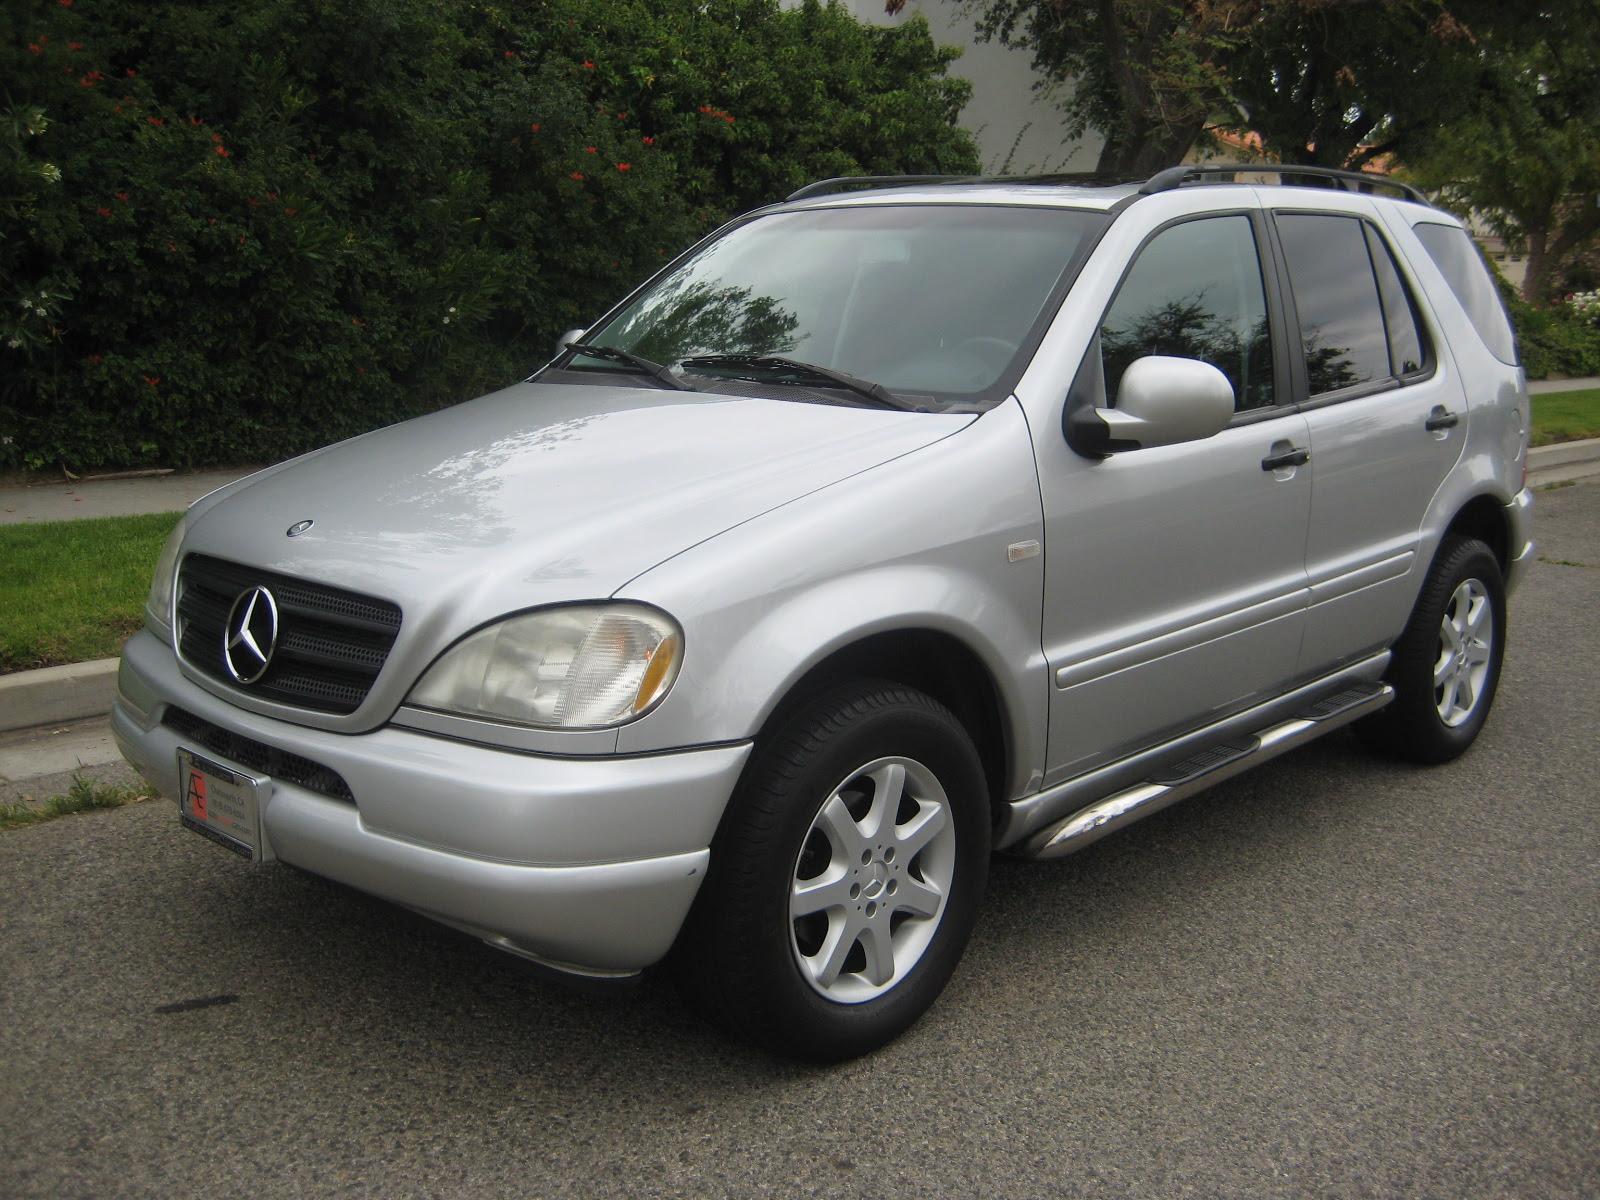 2000 Mercedes-Benz M-Class - Pictures - CarGurus